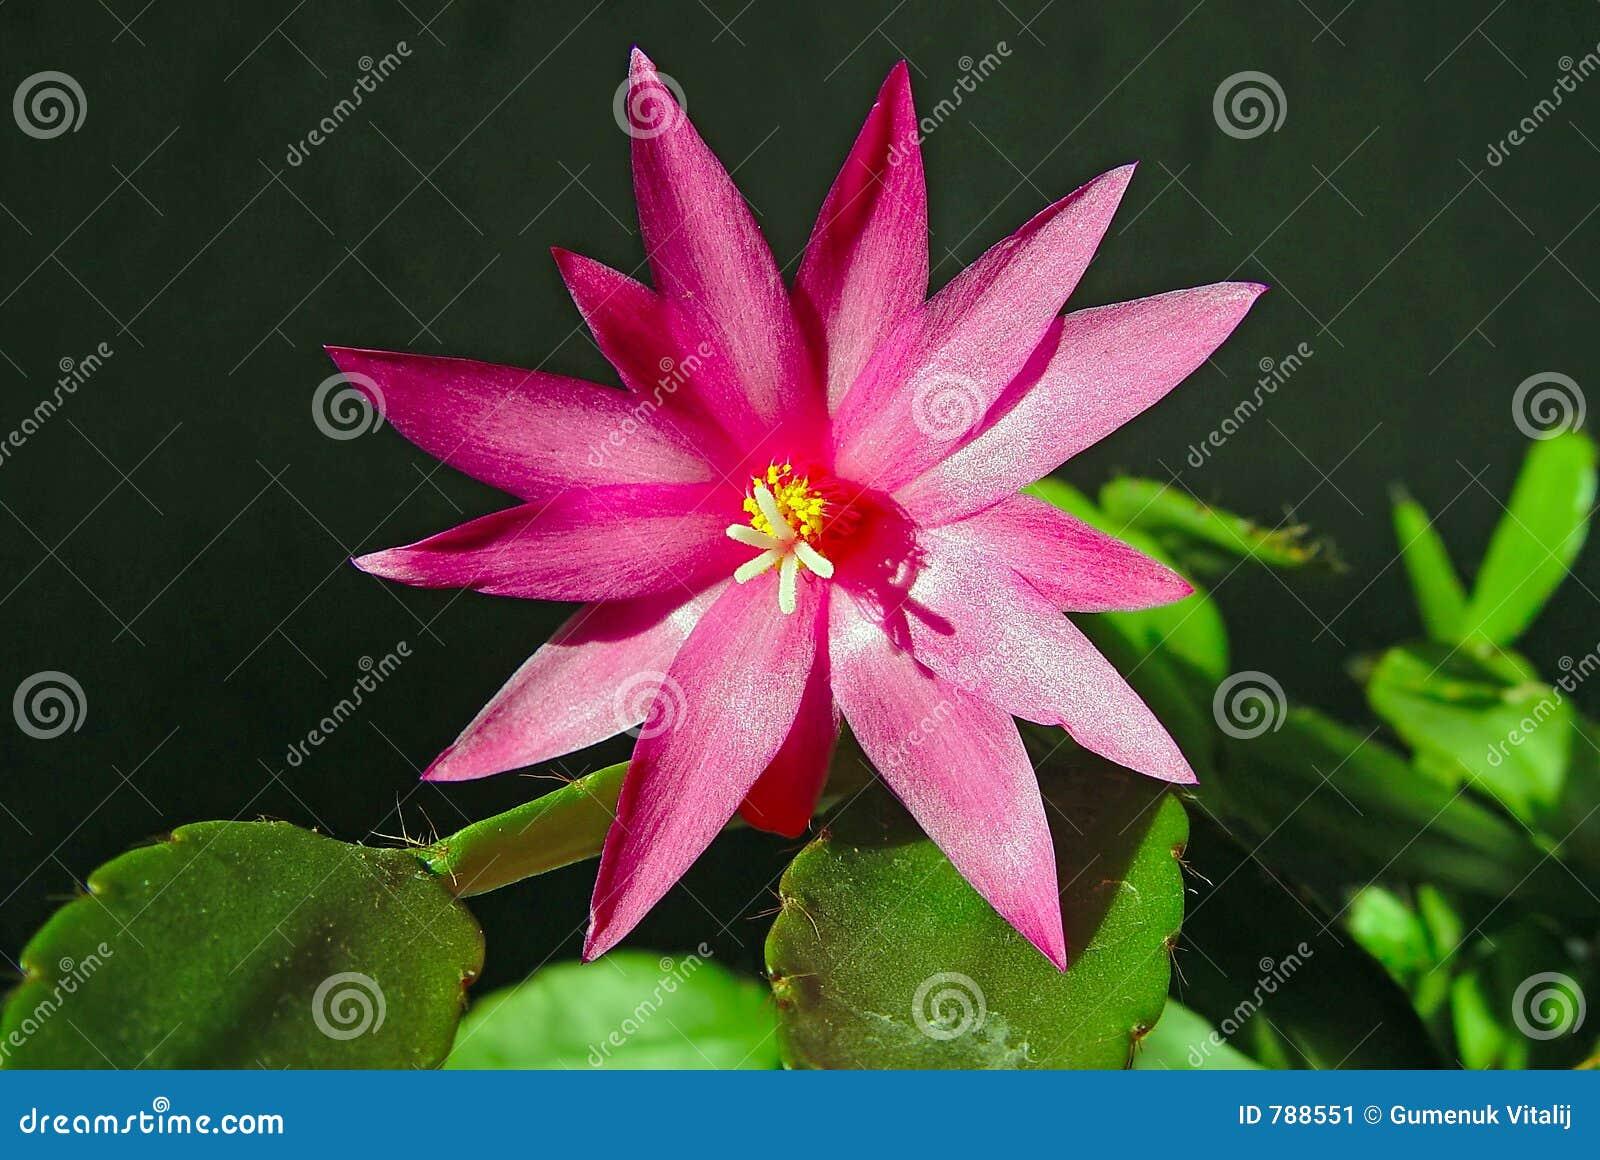 Schlumbergera de floraison de cactus.